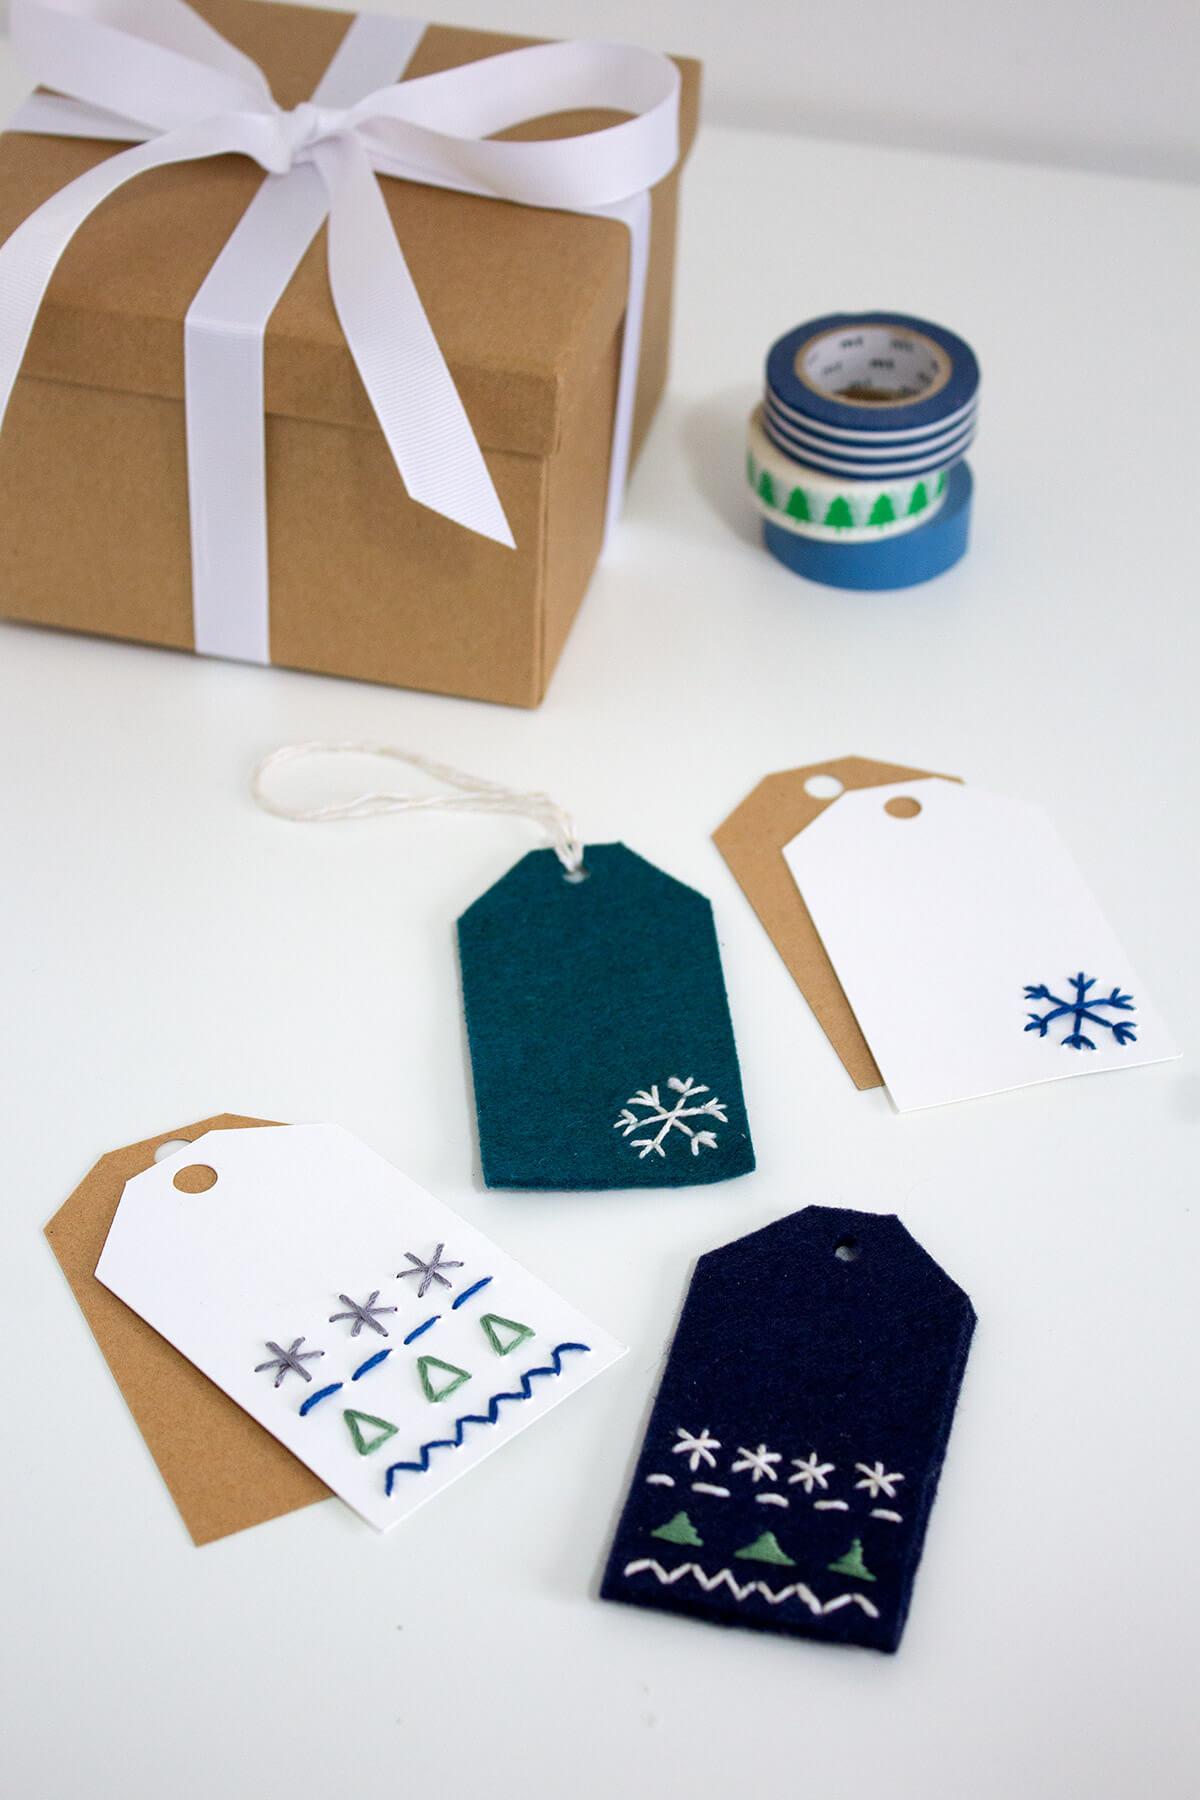 Reusable Embroidered Gift Tags With Free Printable